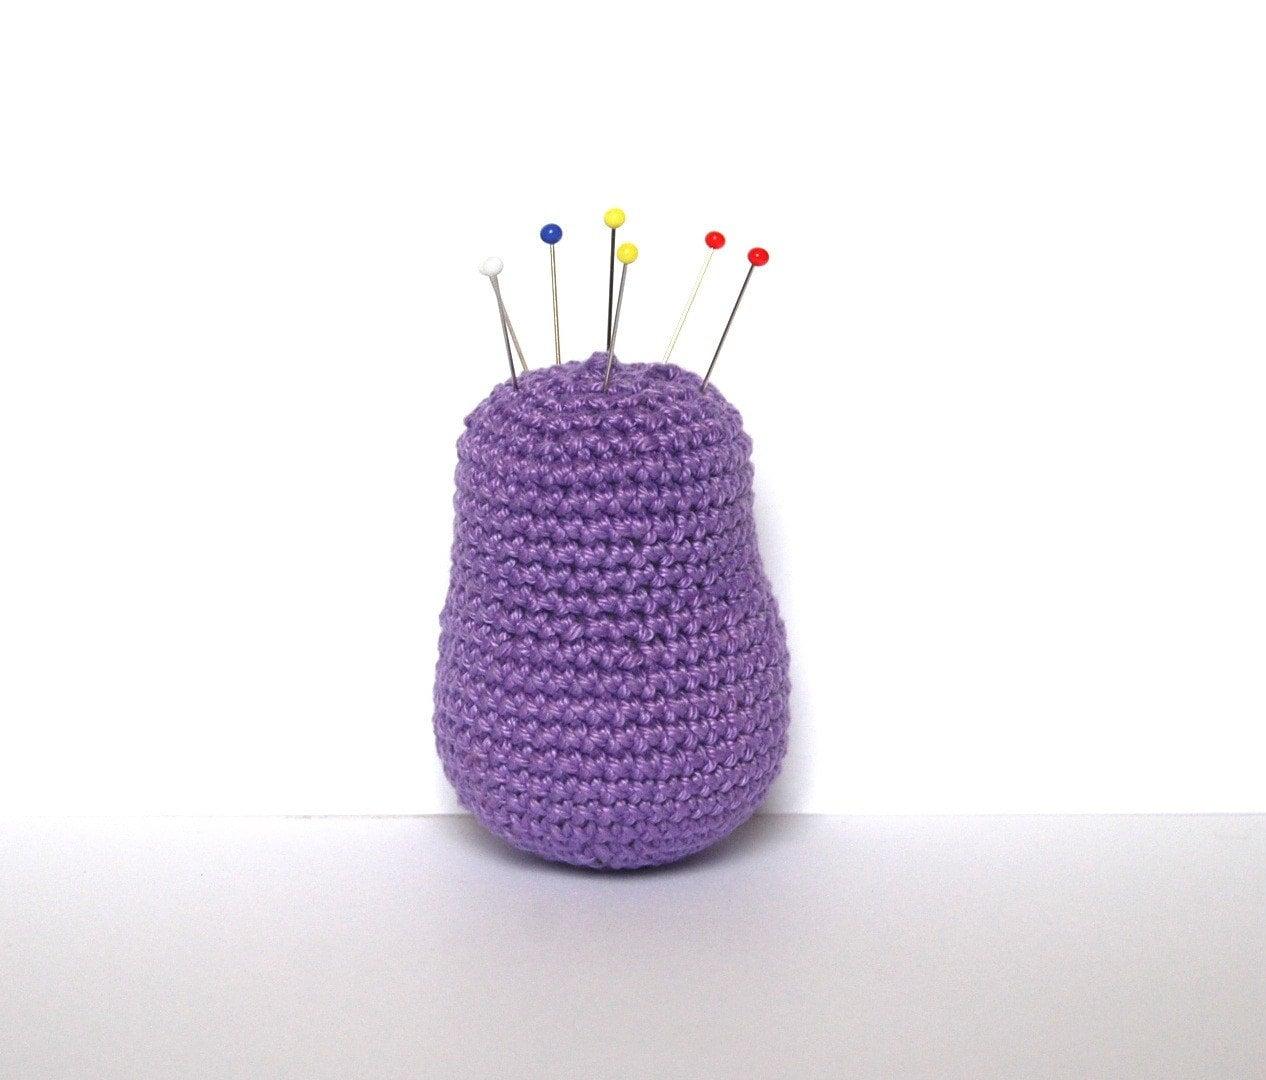 Matryoshka crocheted pin cushion  purple by SpacejamHandmade from etsy.com